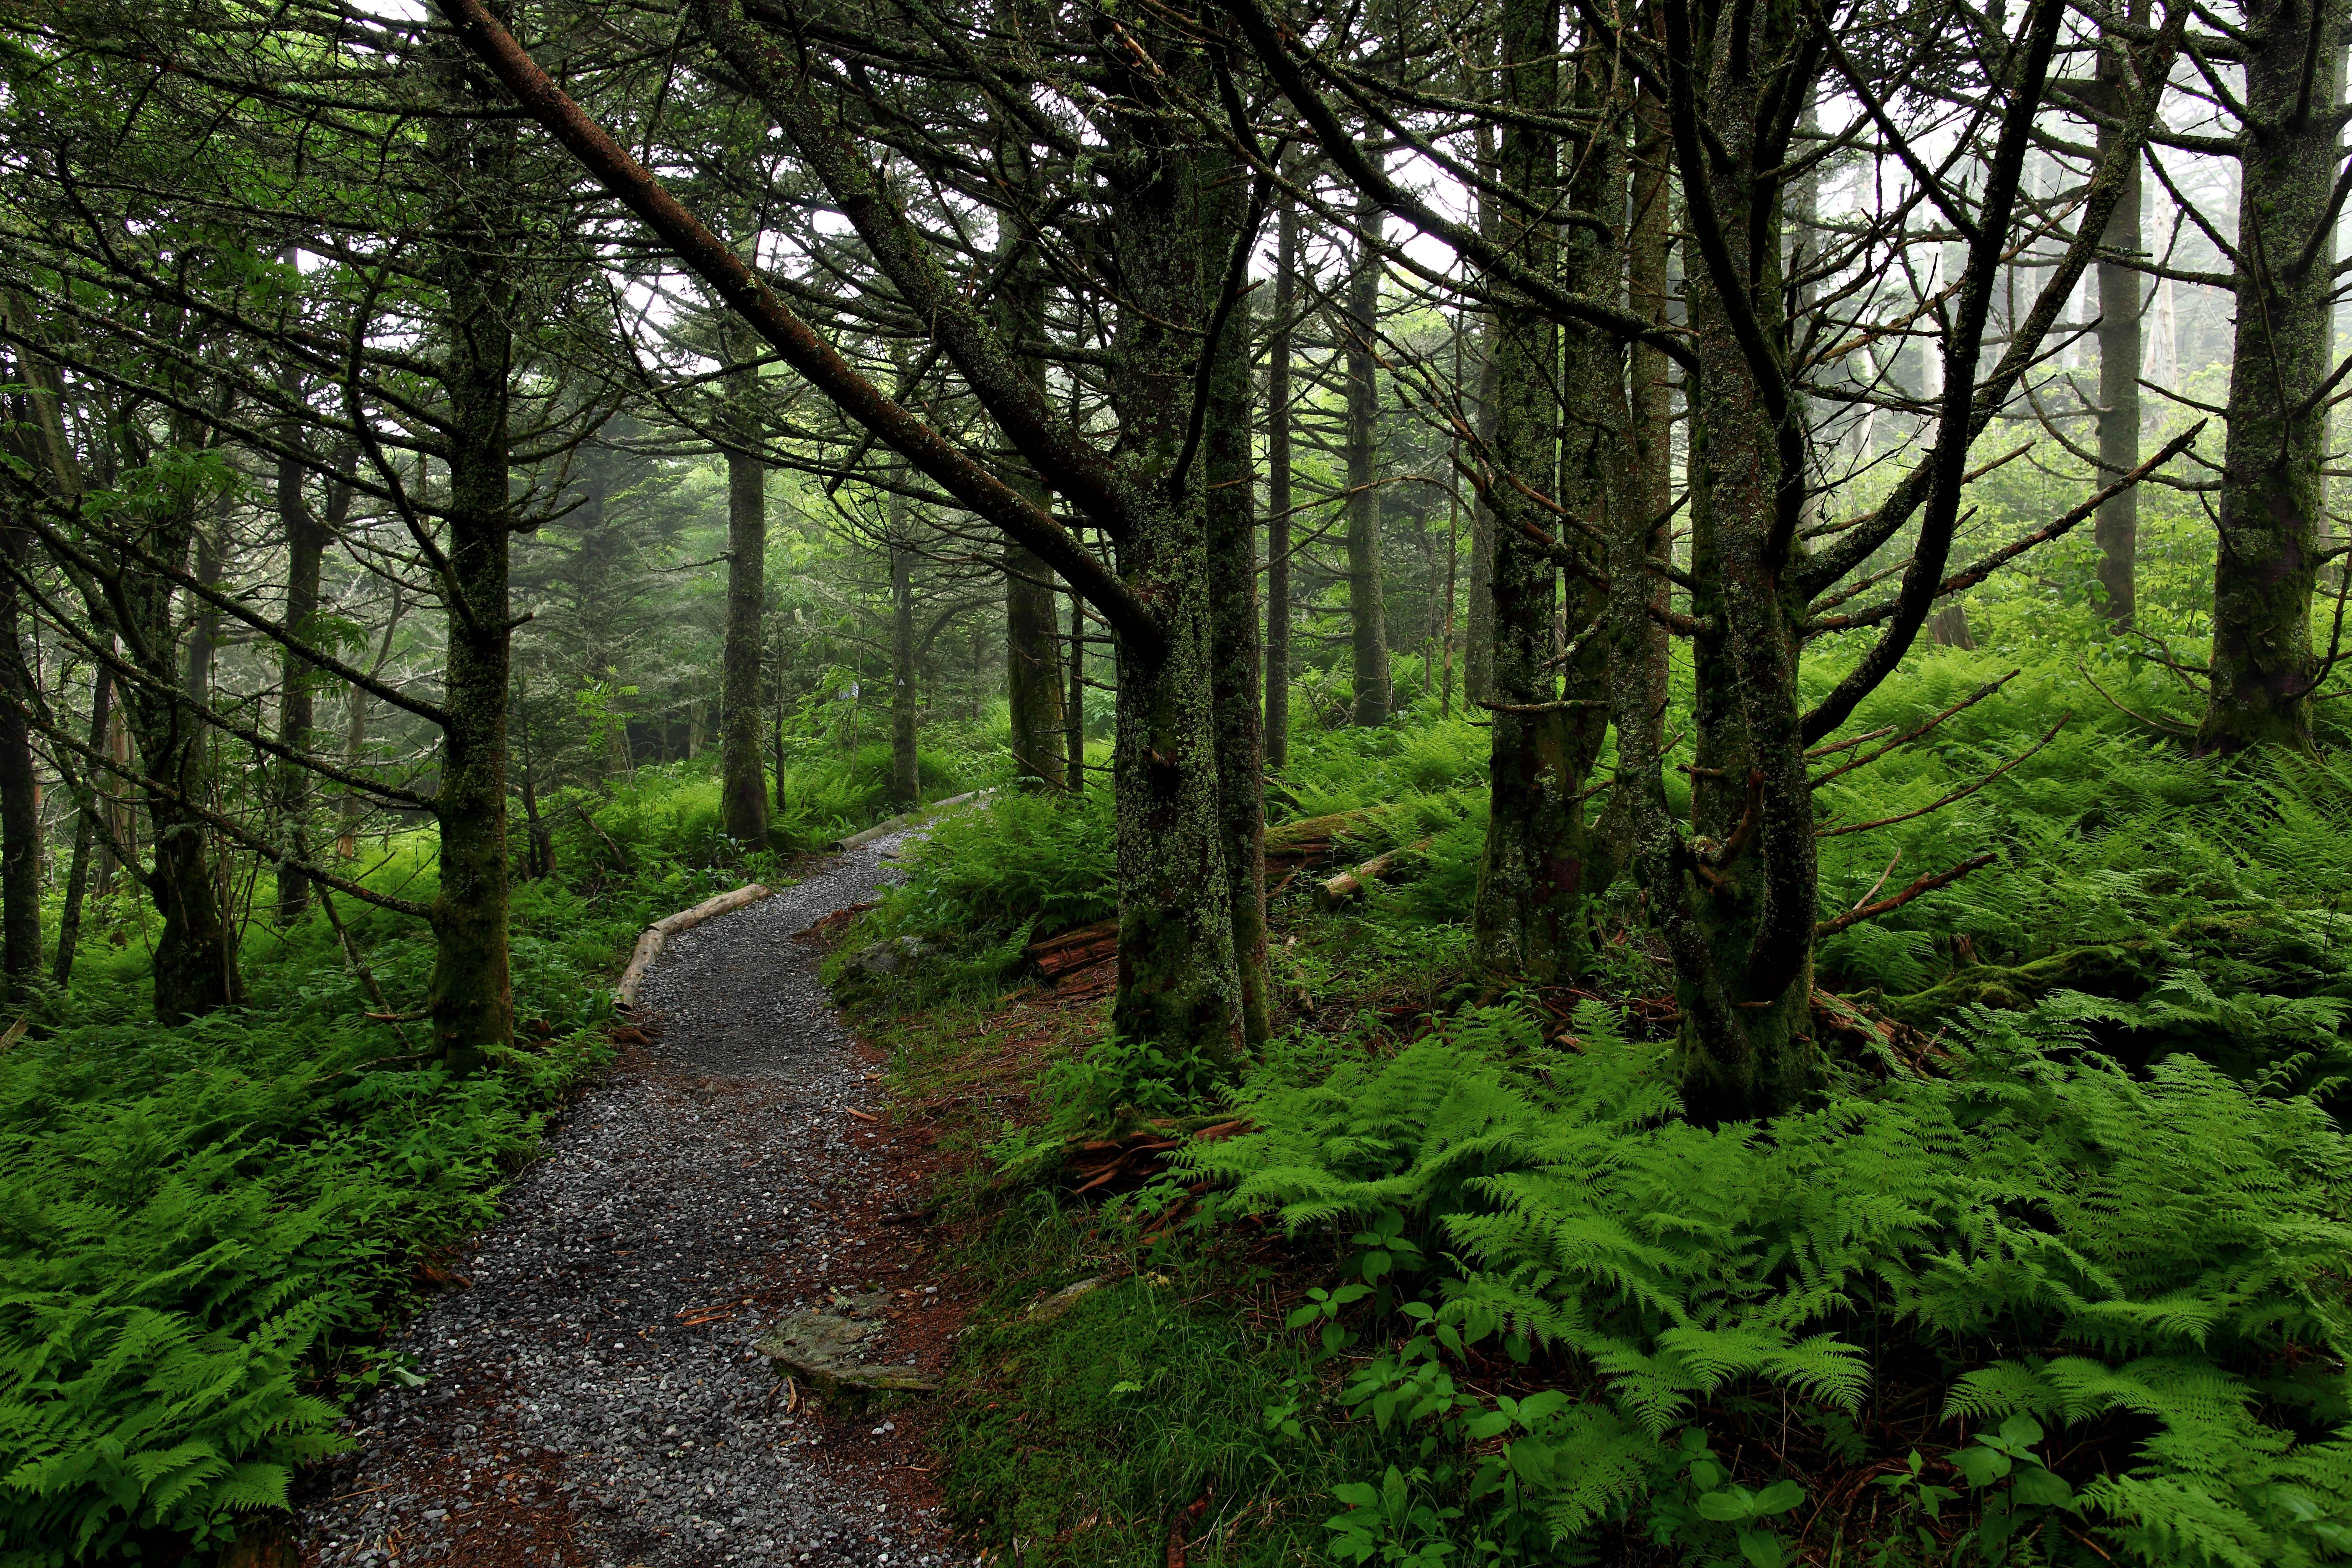 hiking nature wallpaper - photo #26